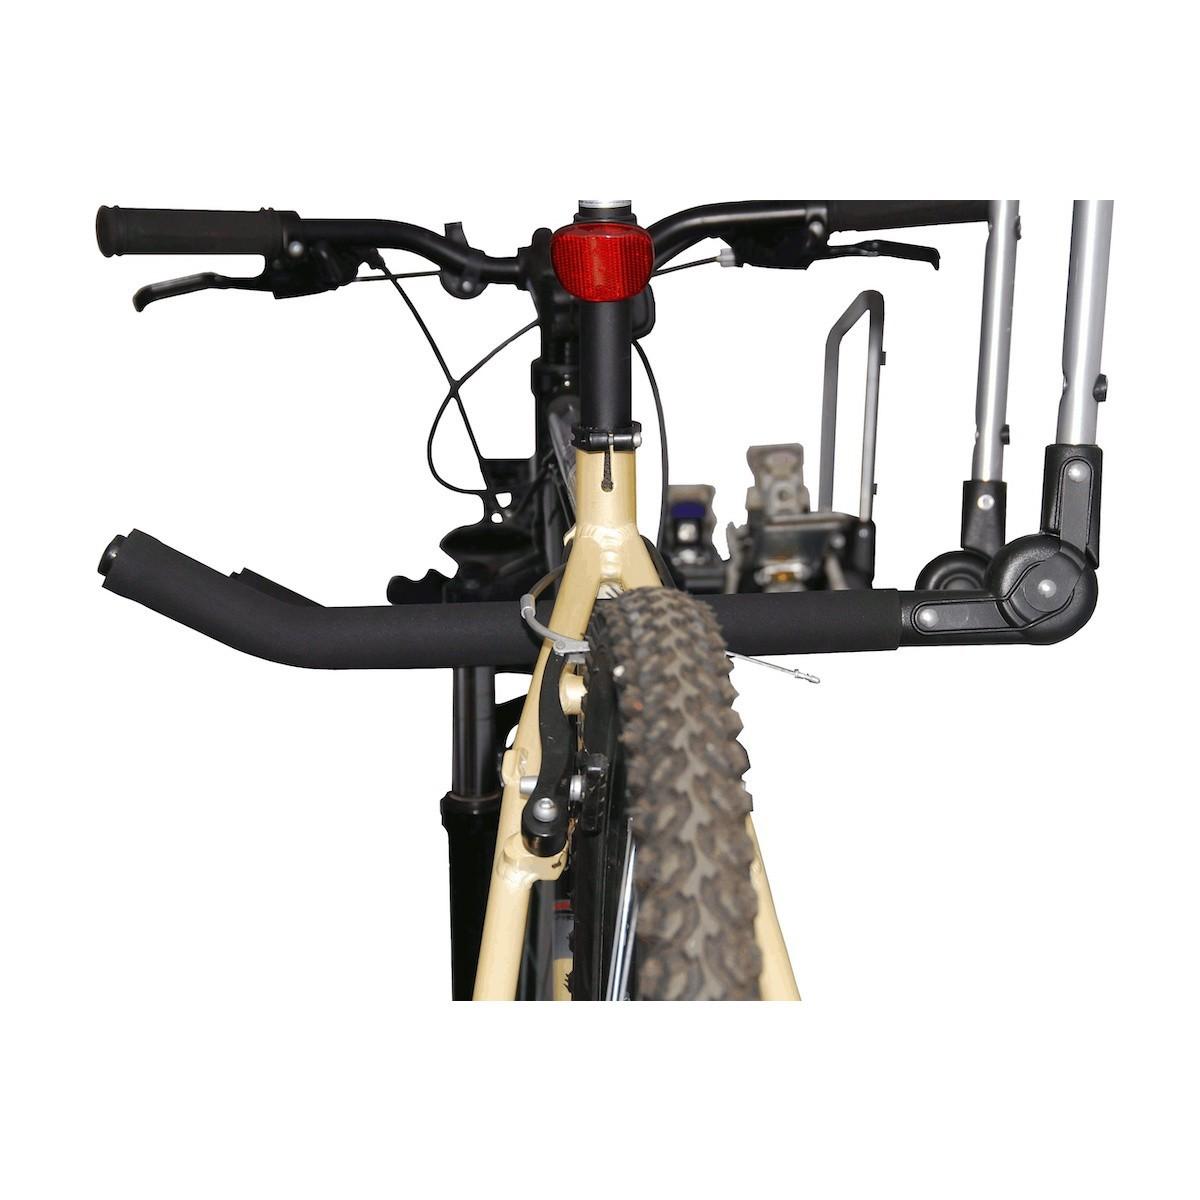 Držiak na bicykel úchyt na lyže megamix.sk